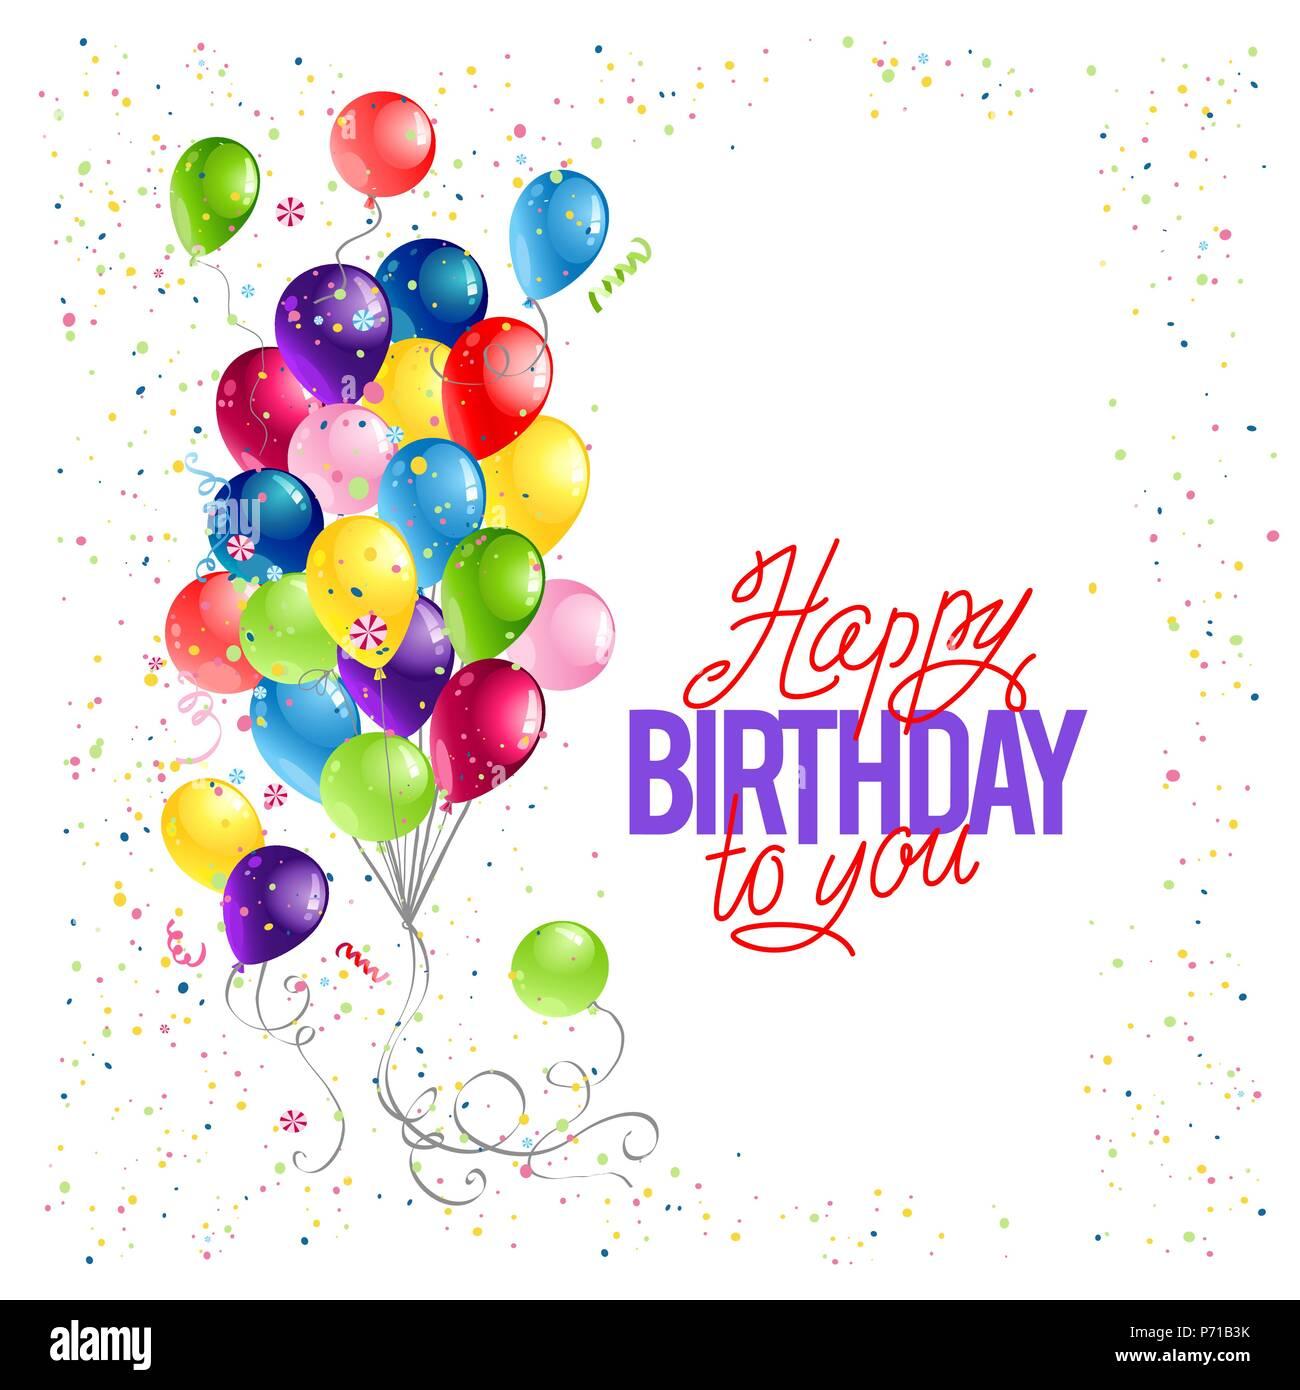 Happy Birthday Card Template Stock Vector Art